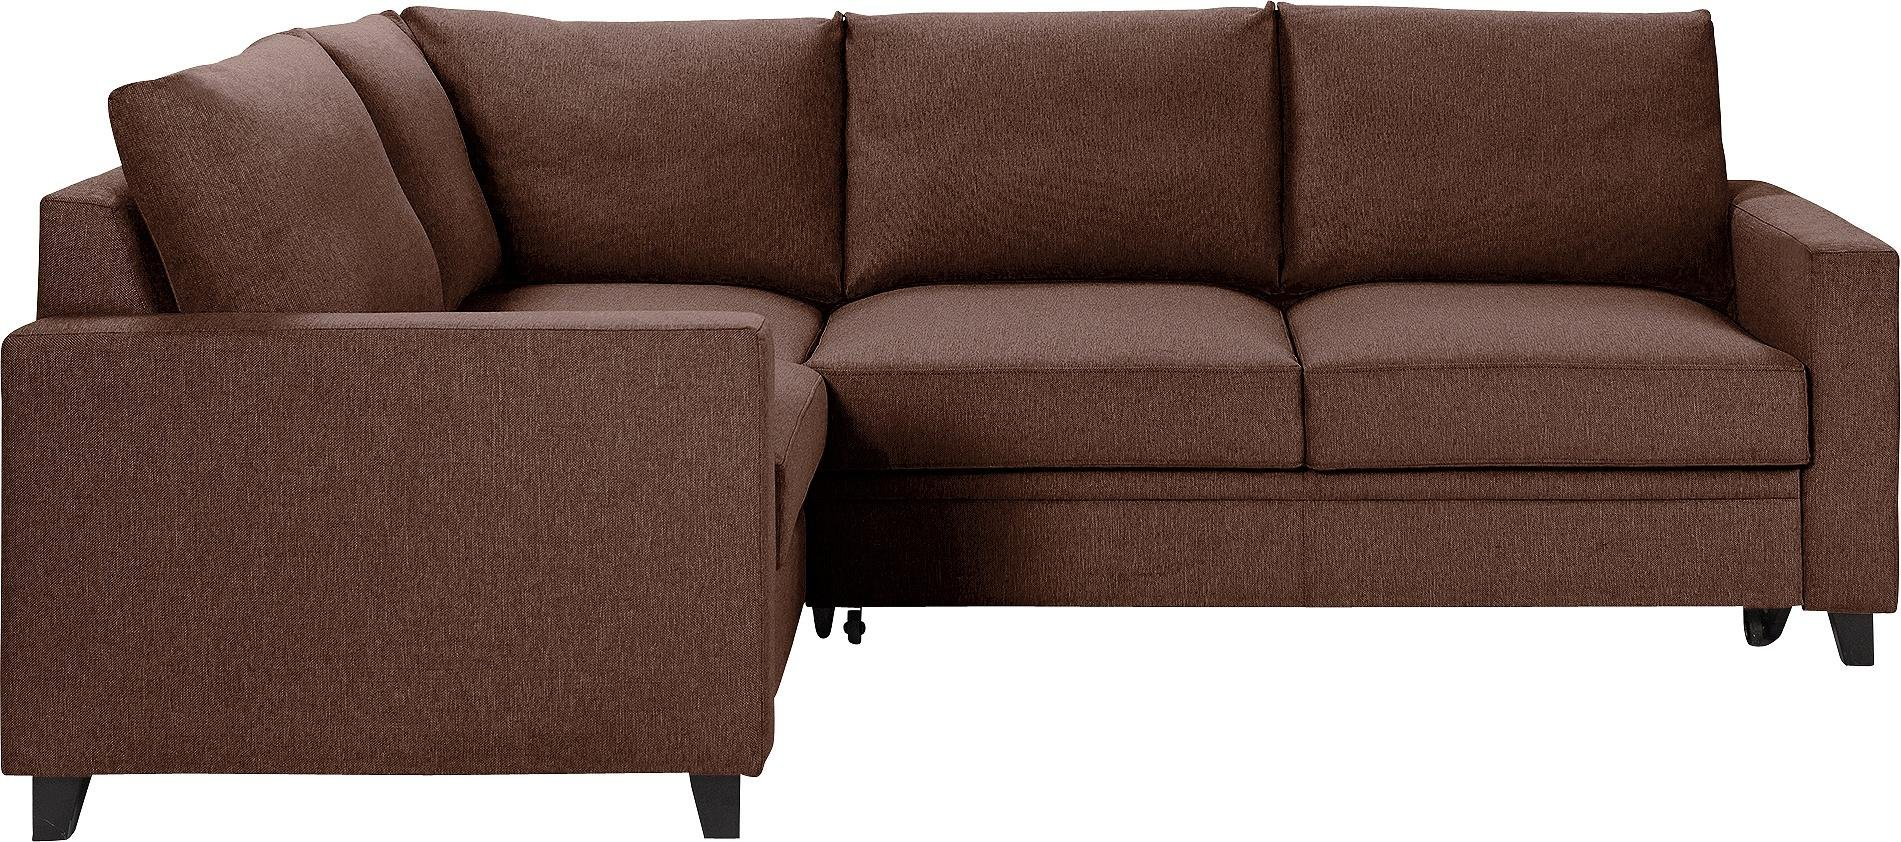 Hygena seattle fabric left hand corner sofa bed gay for Sofa bed 549 artek